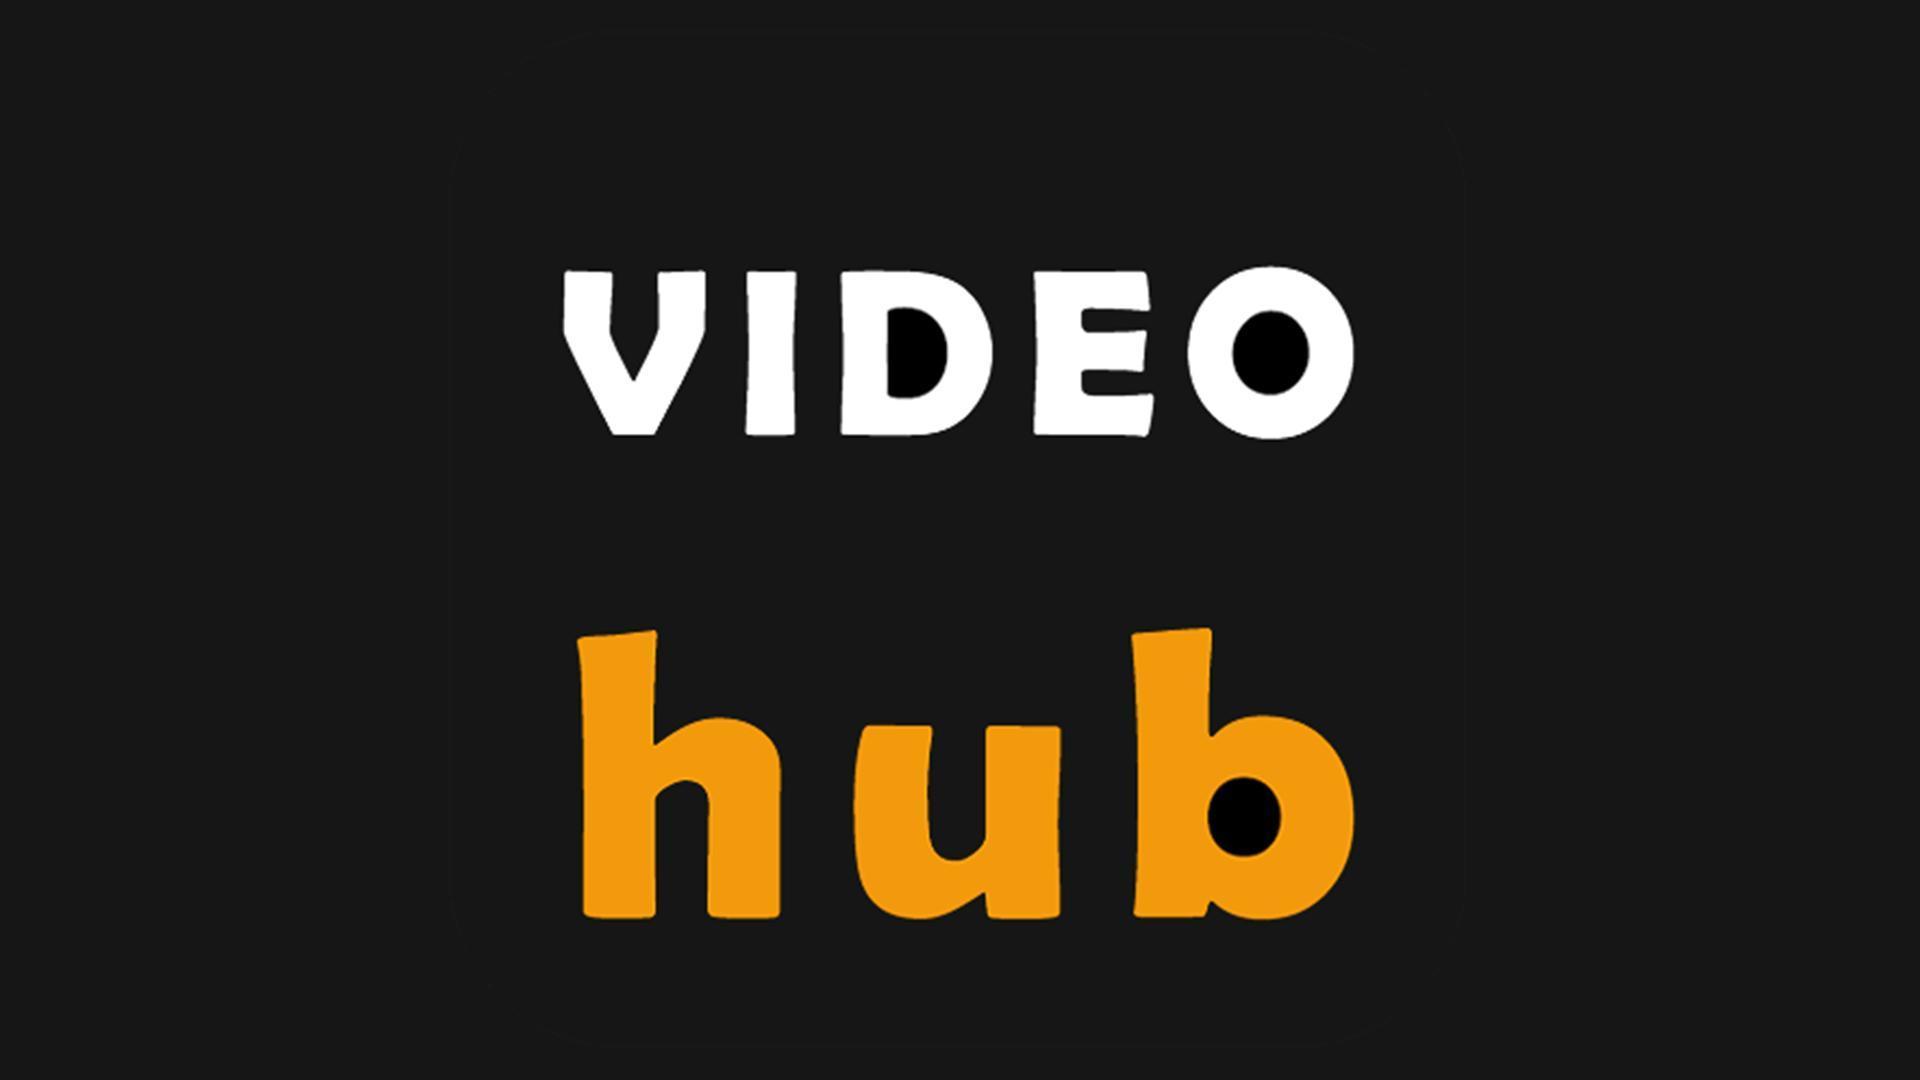 App Pornhub pornhub app for android - apk download